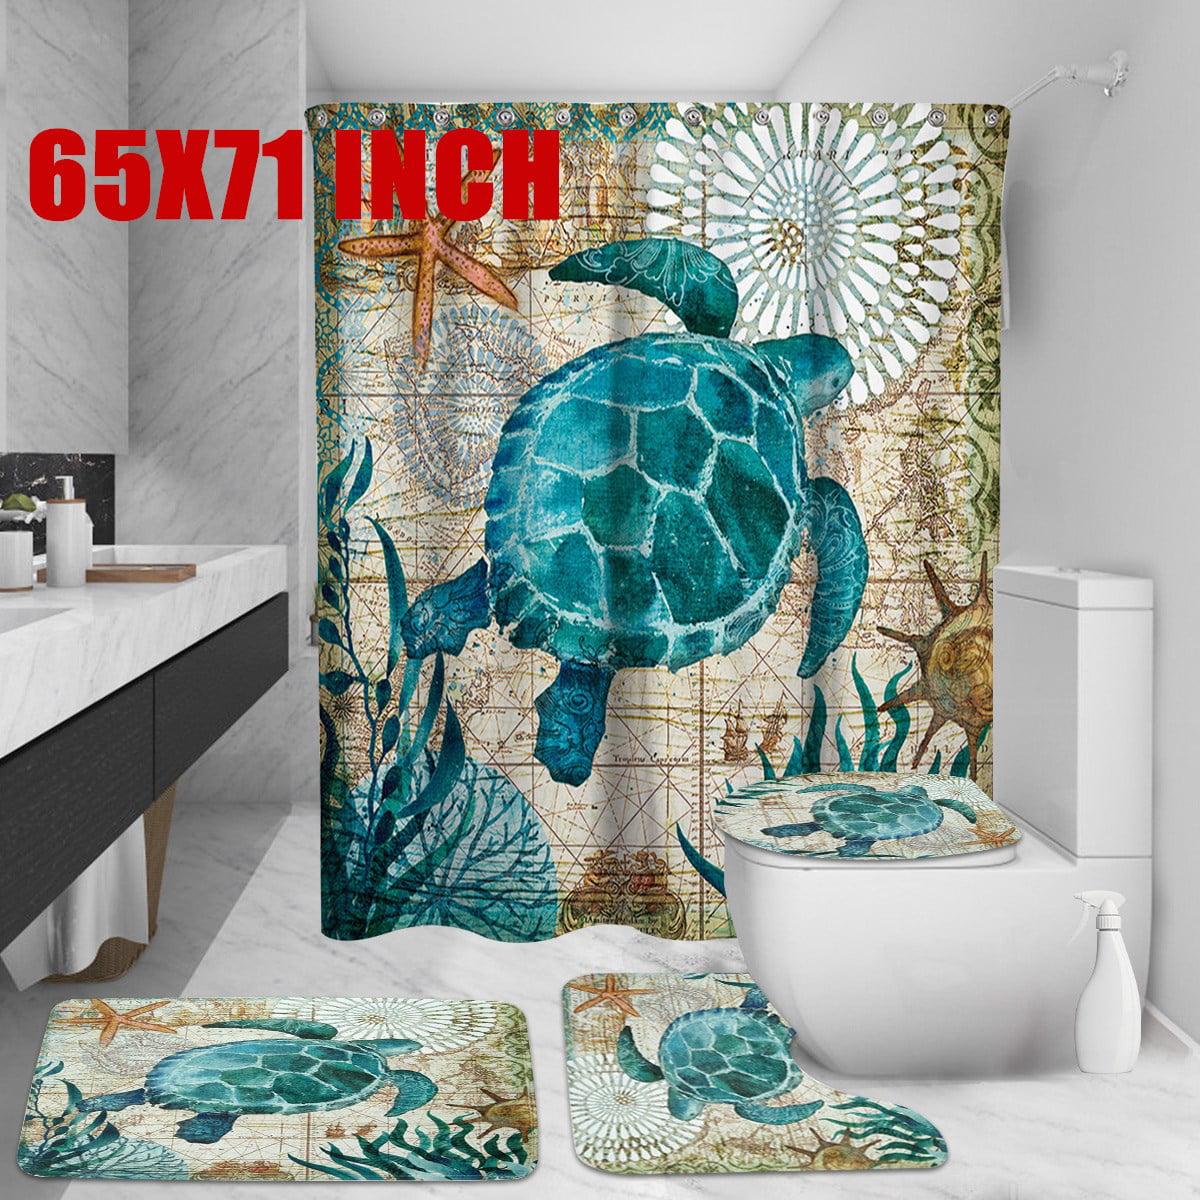 Sea Turtles Waterproof Bathroom Shower Curtain Toilet Cover Mat Non-Slip Rug